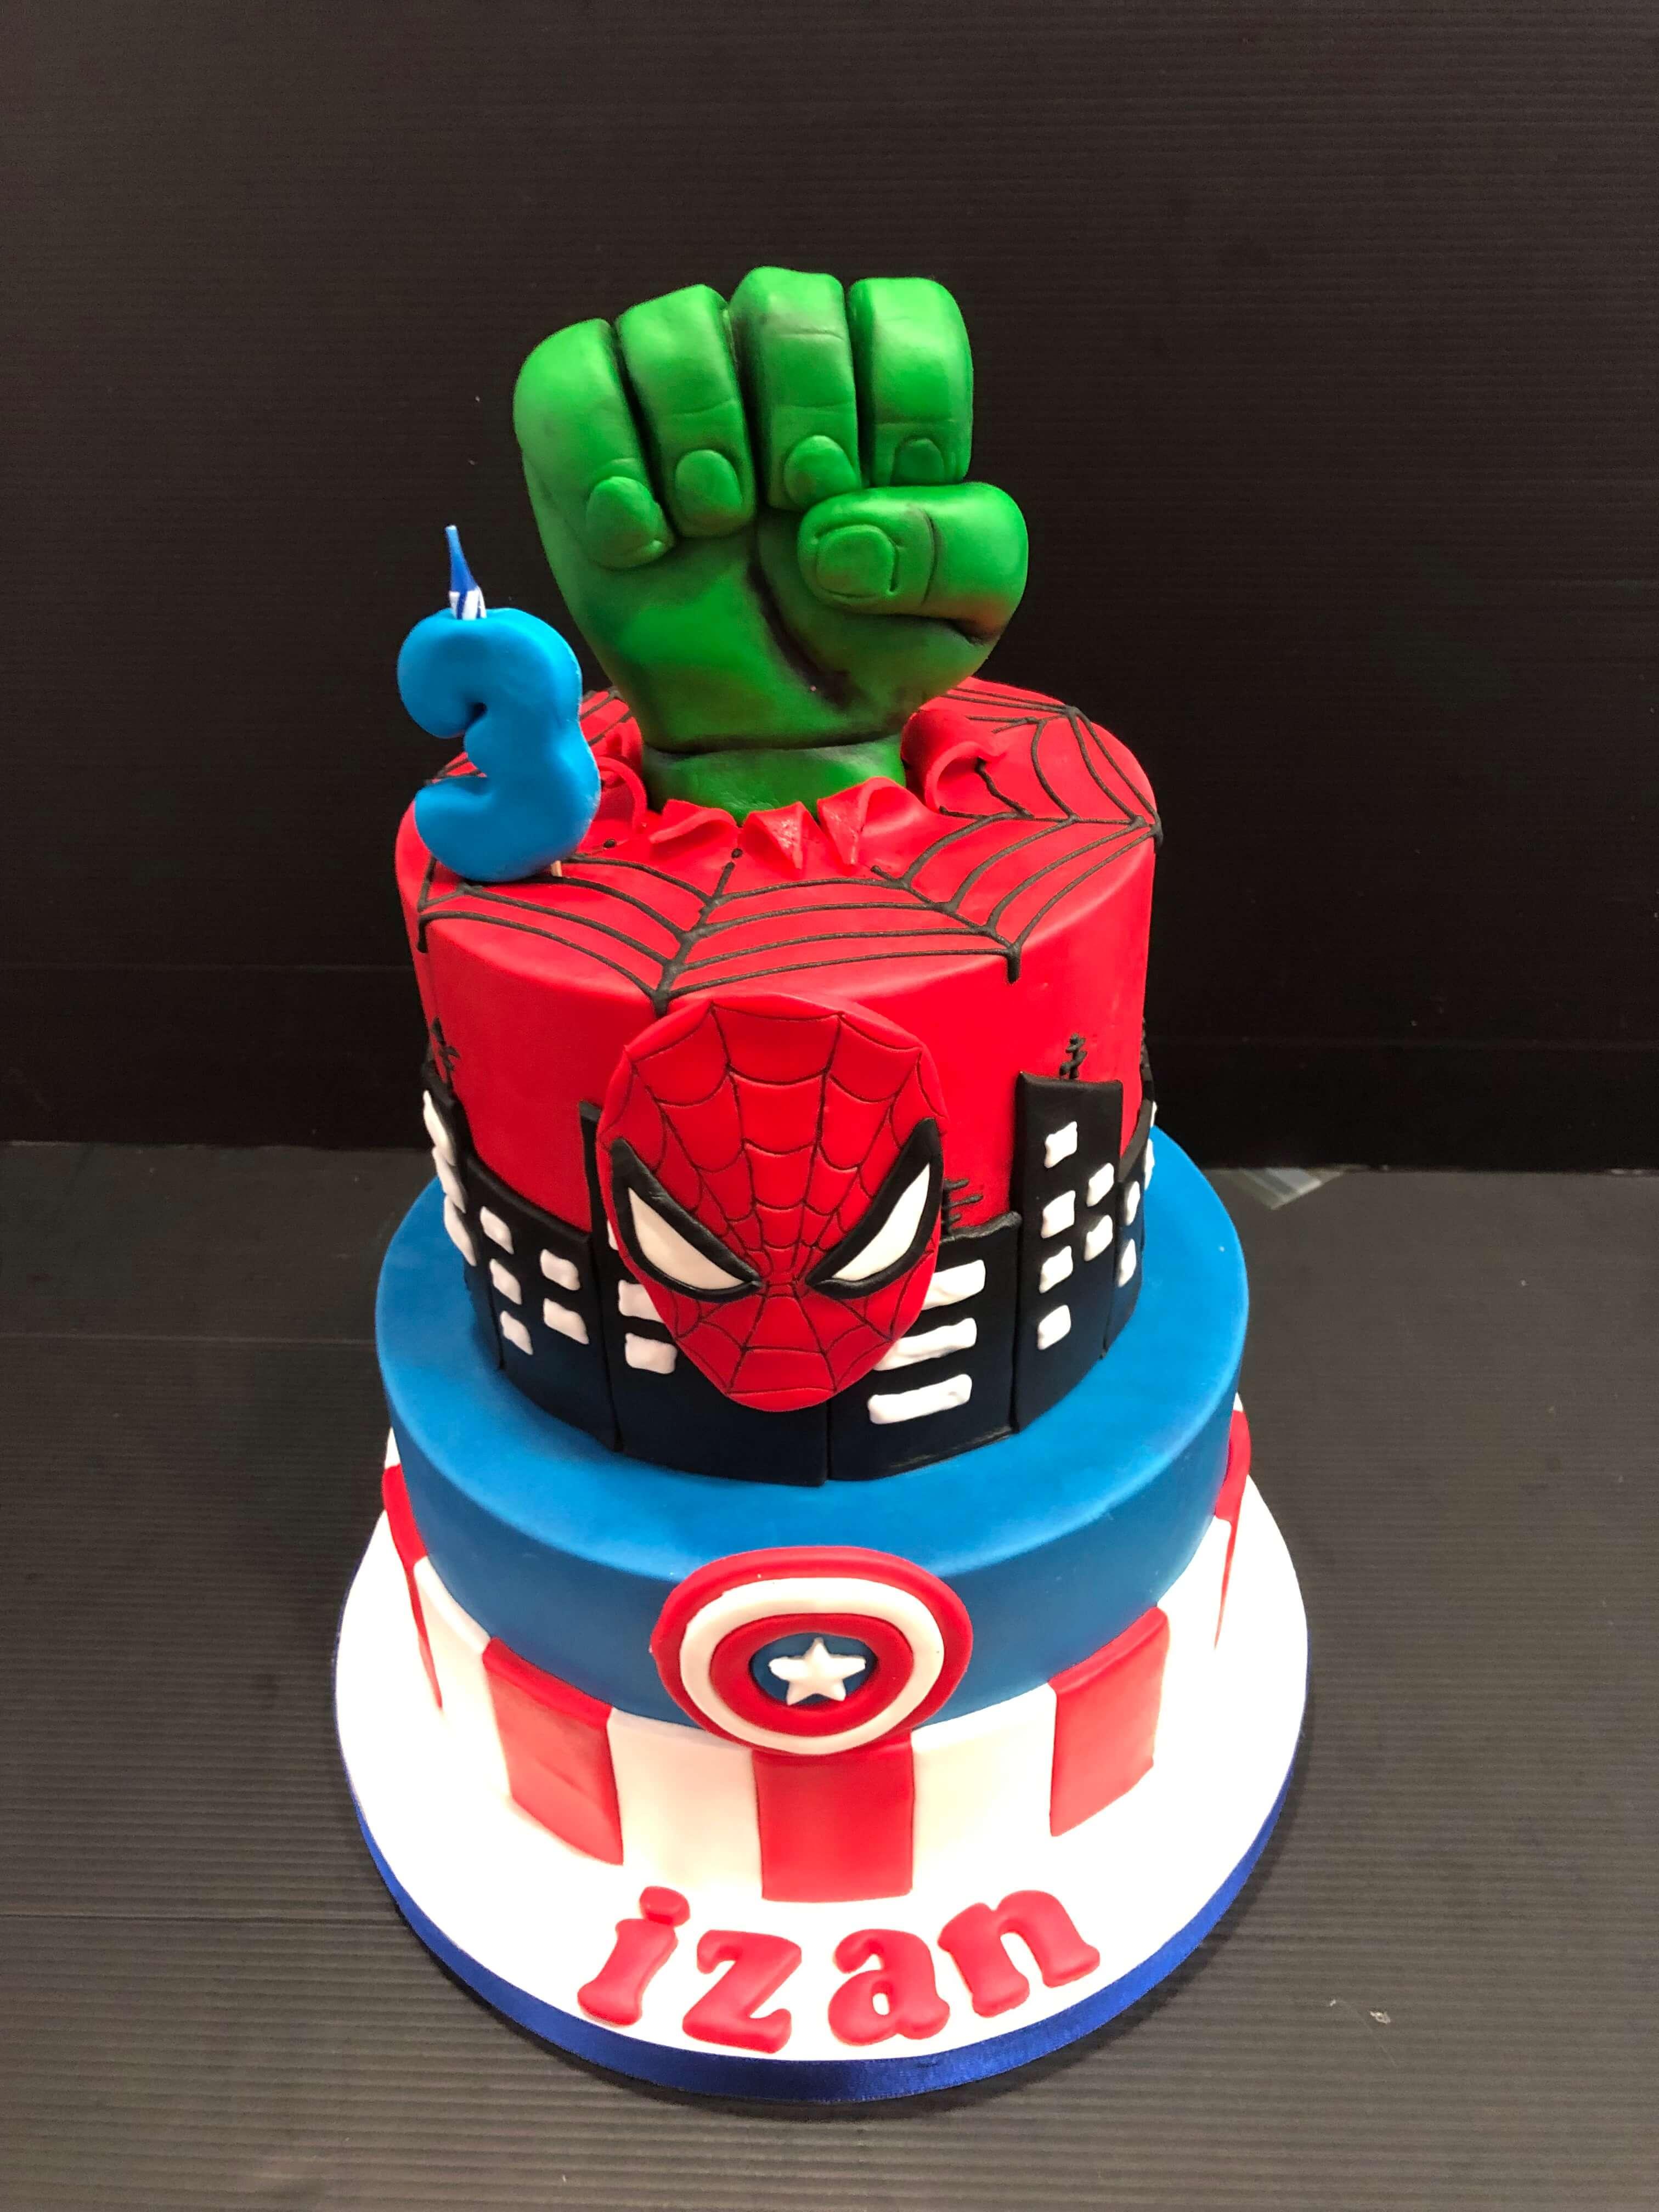 Tarta fondant super heroes spiderman hulk capitán américa